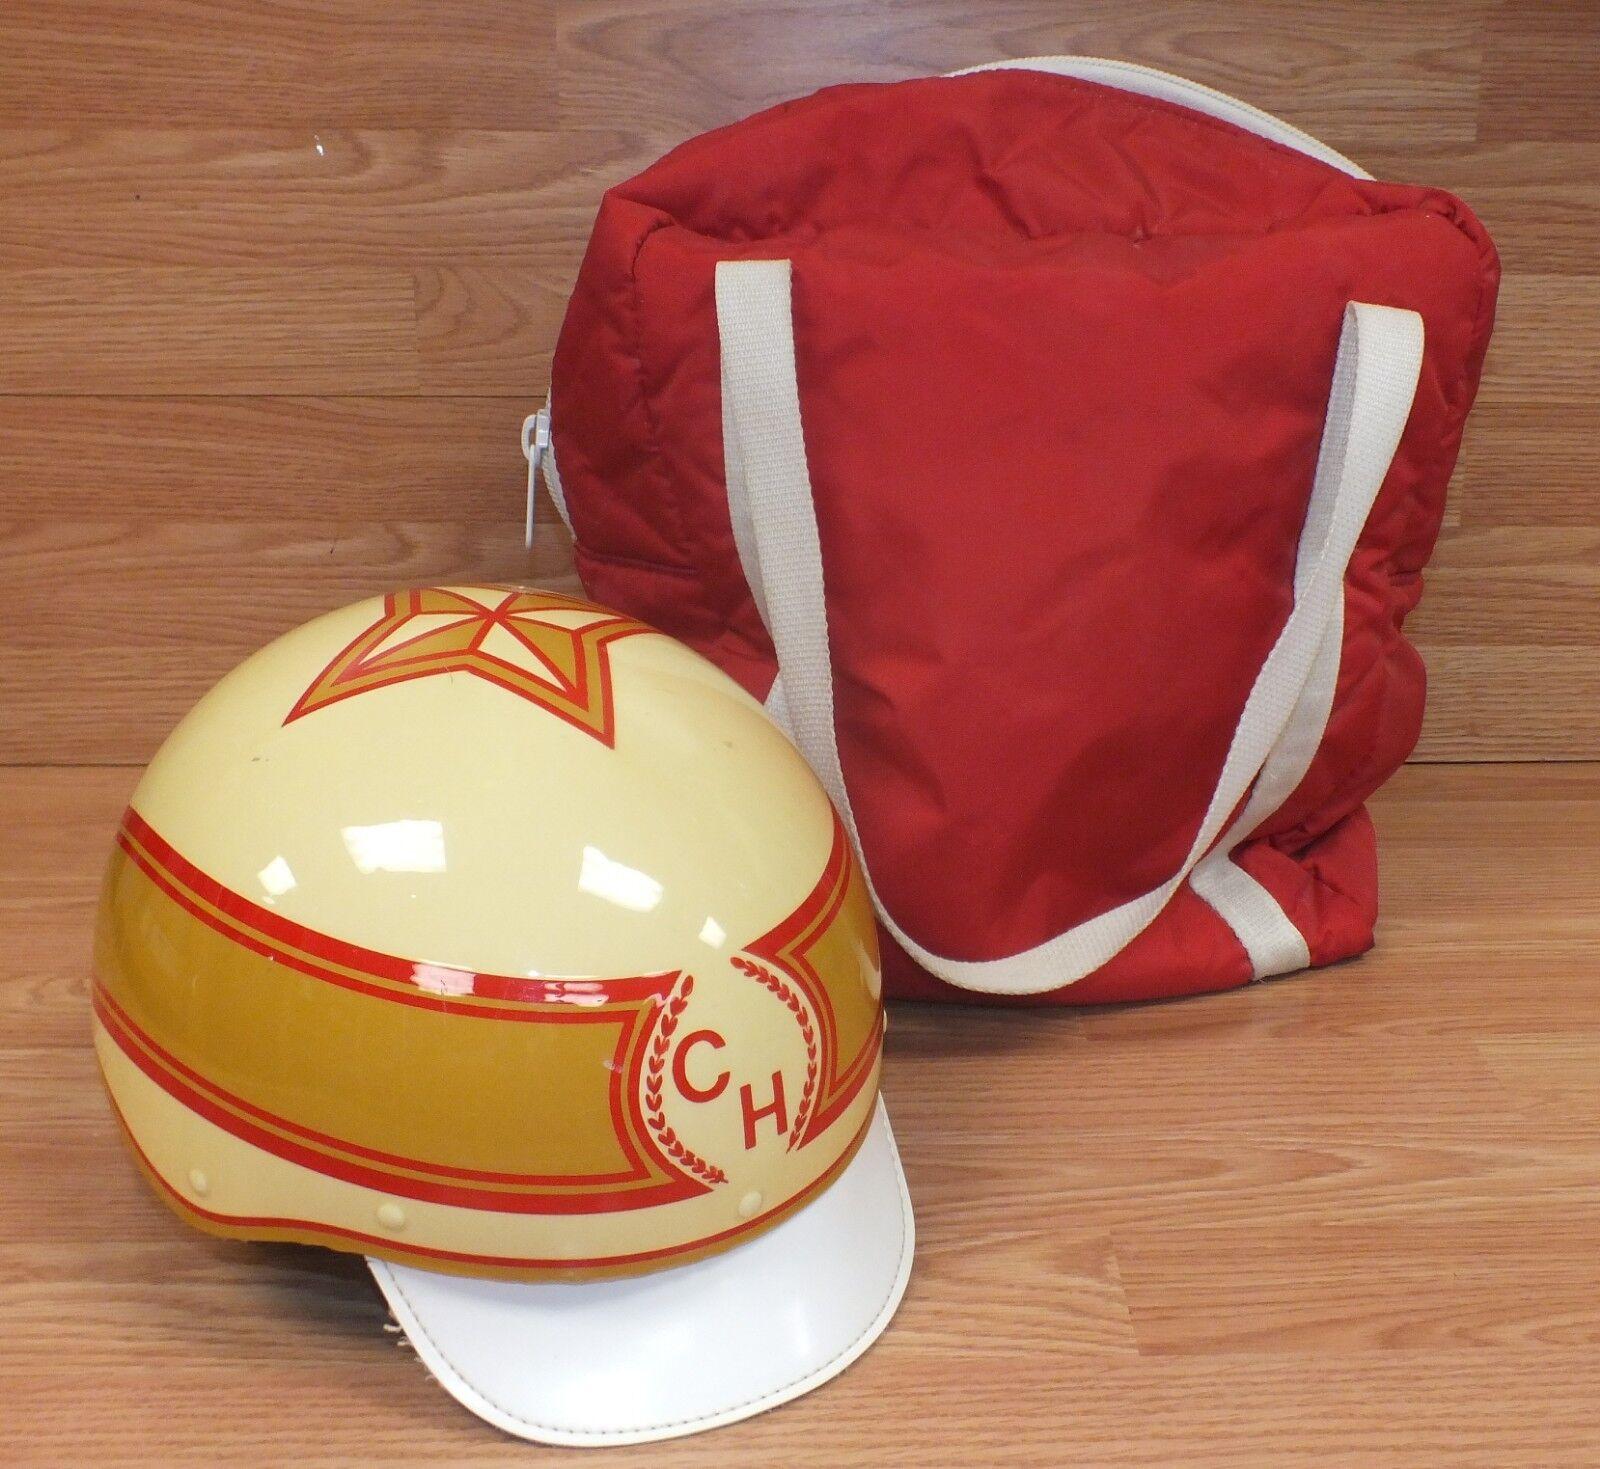 Genuine Vintage Howard Kincannon / Onell H84 Horse Racing Riding Helmet w/ Bag